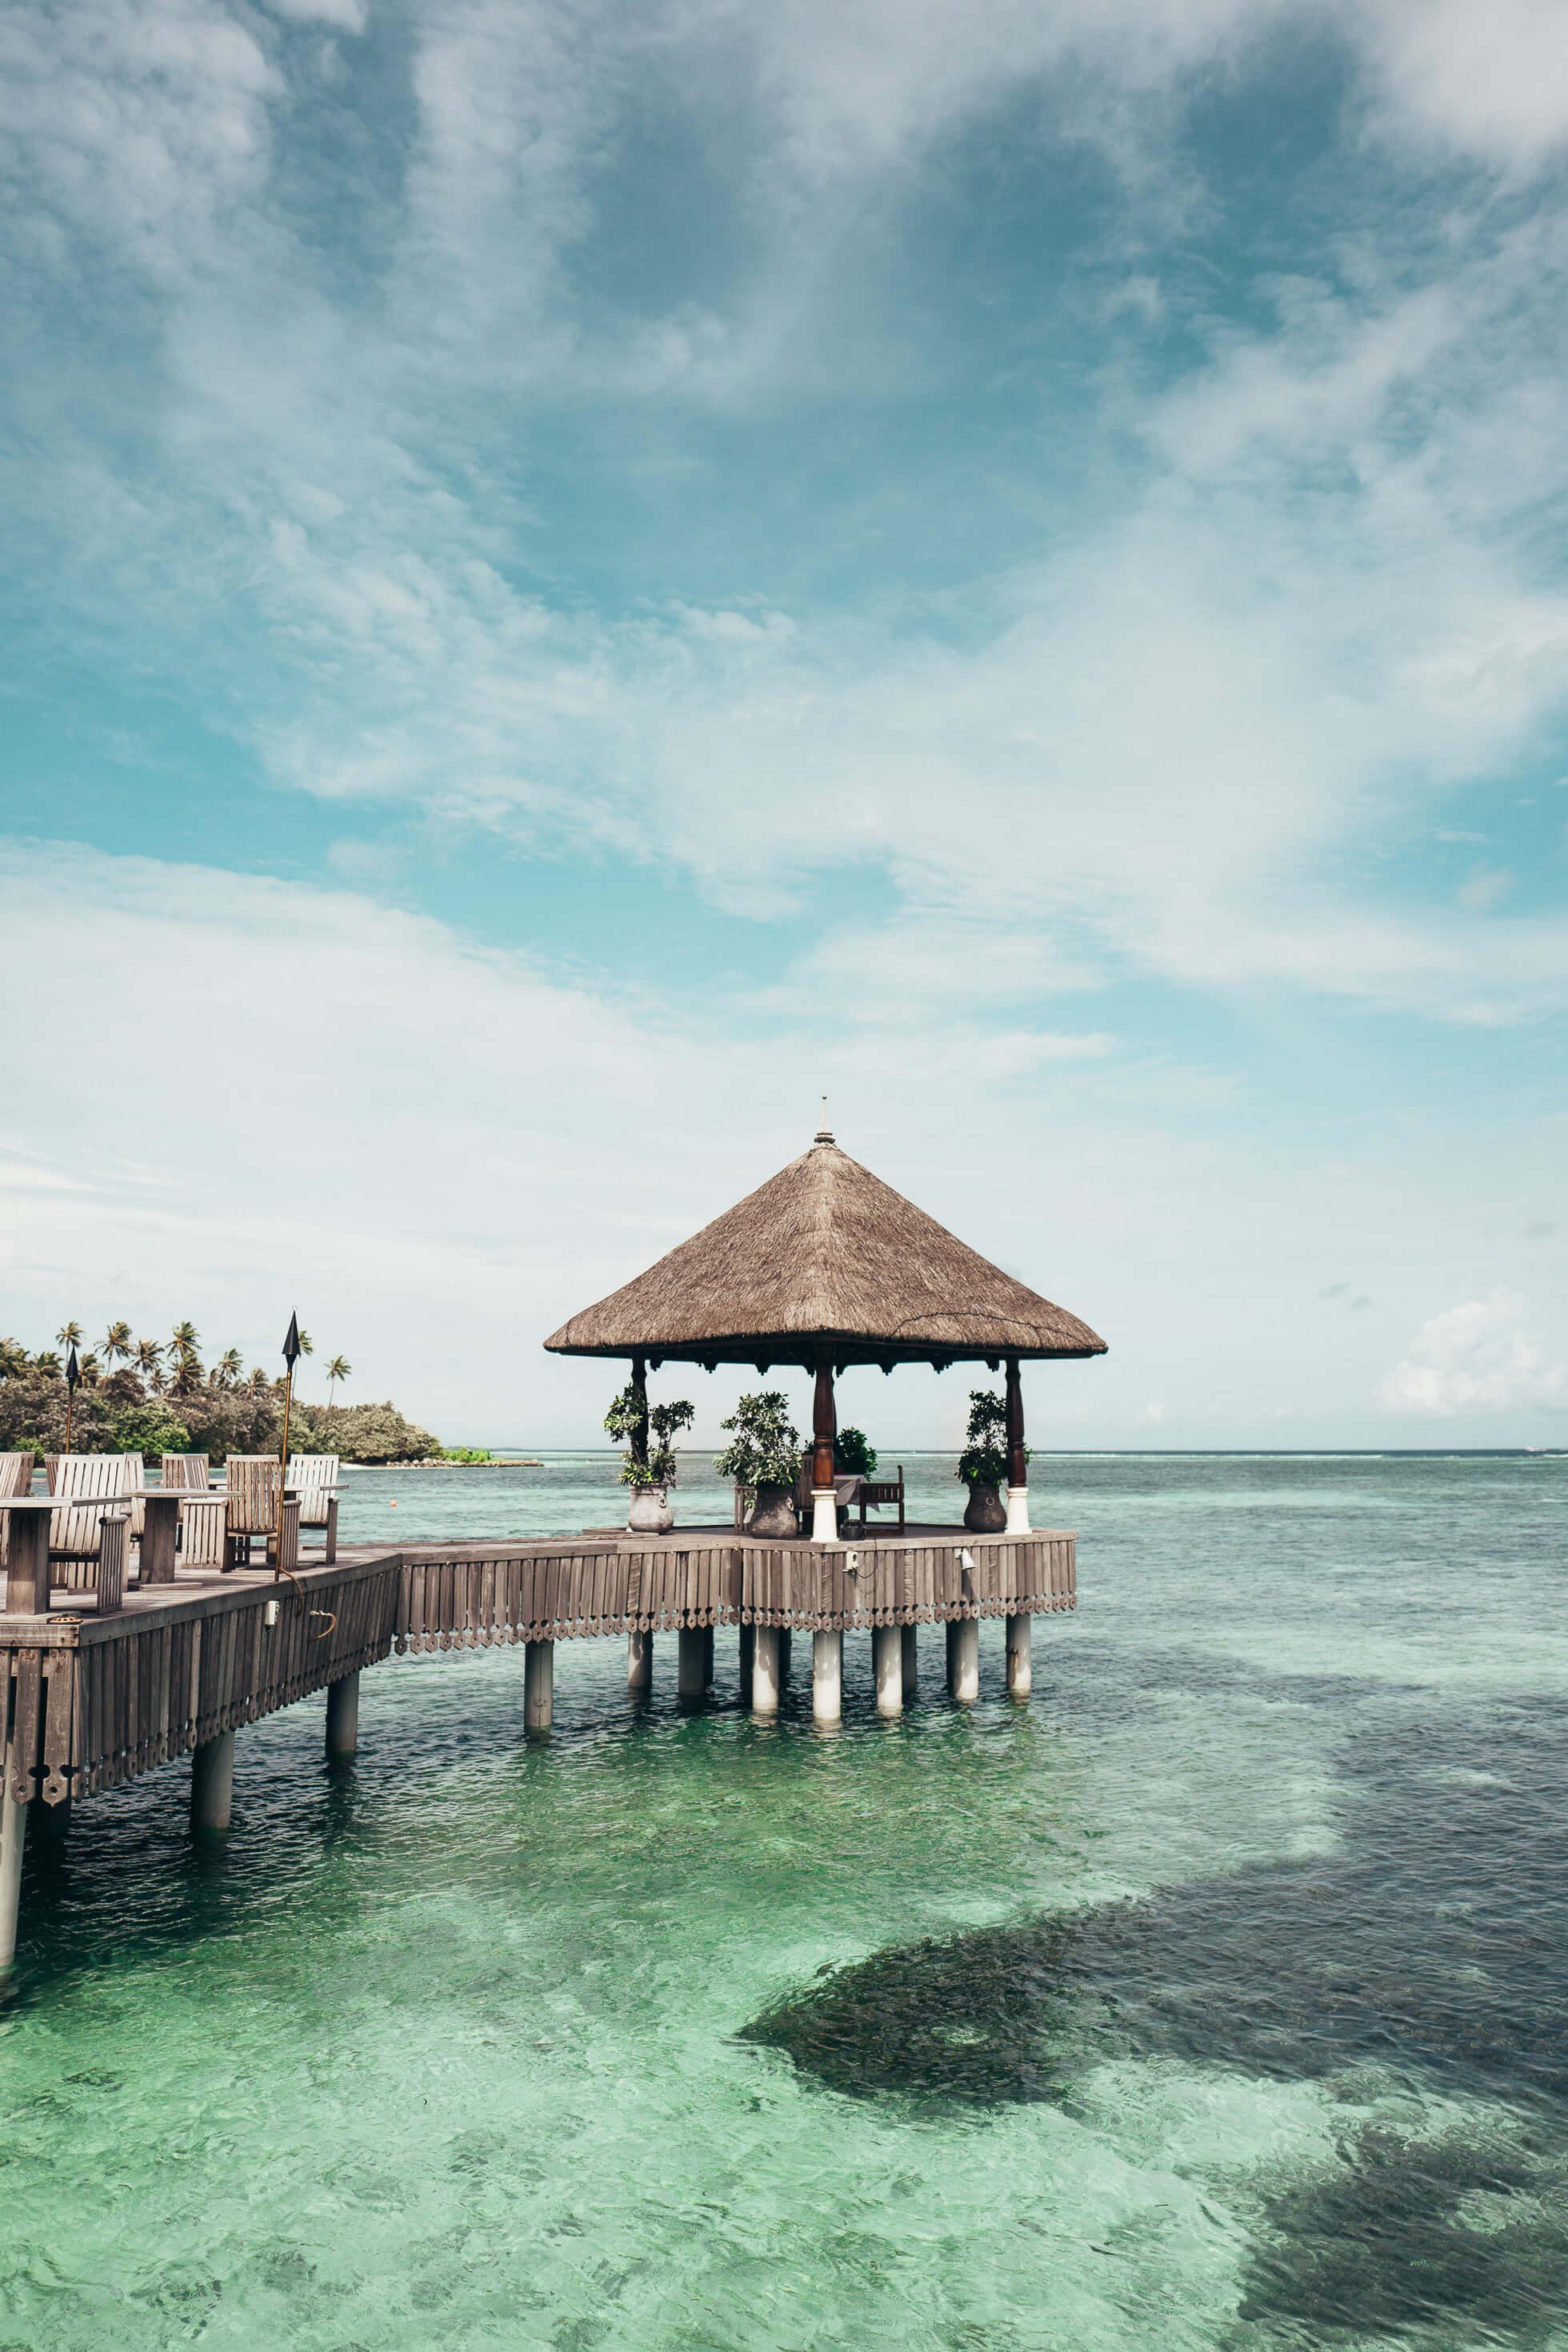 janni-deler-four-seasons-resort-maldivesl1140395